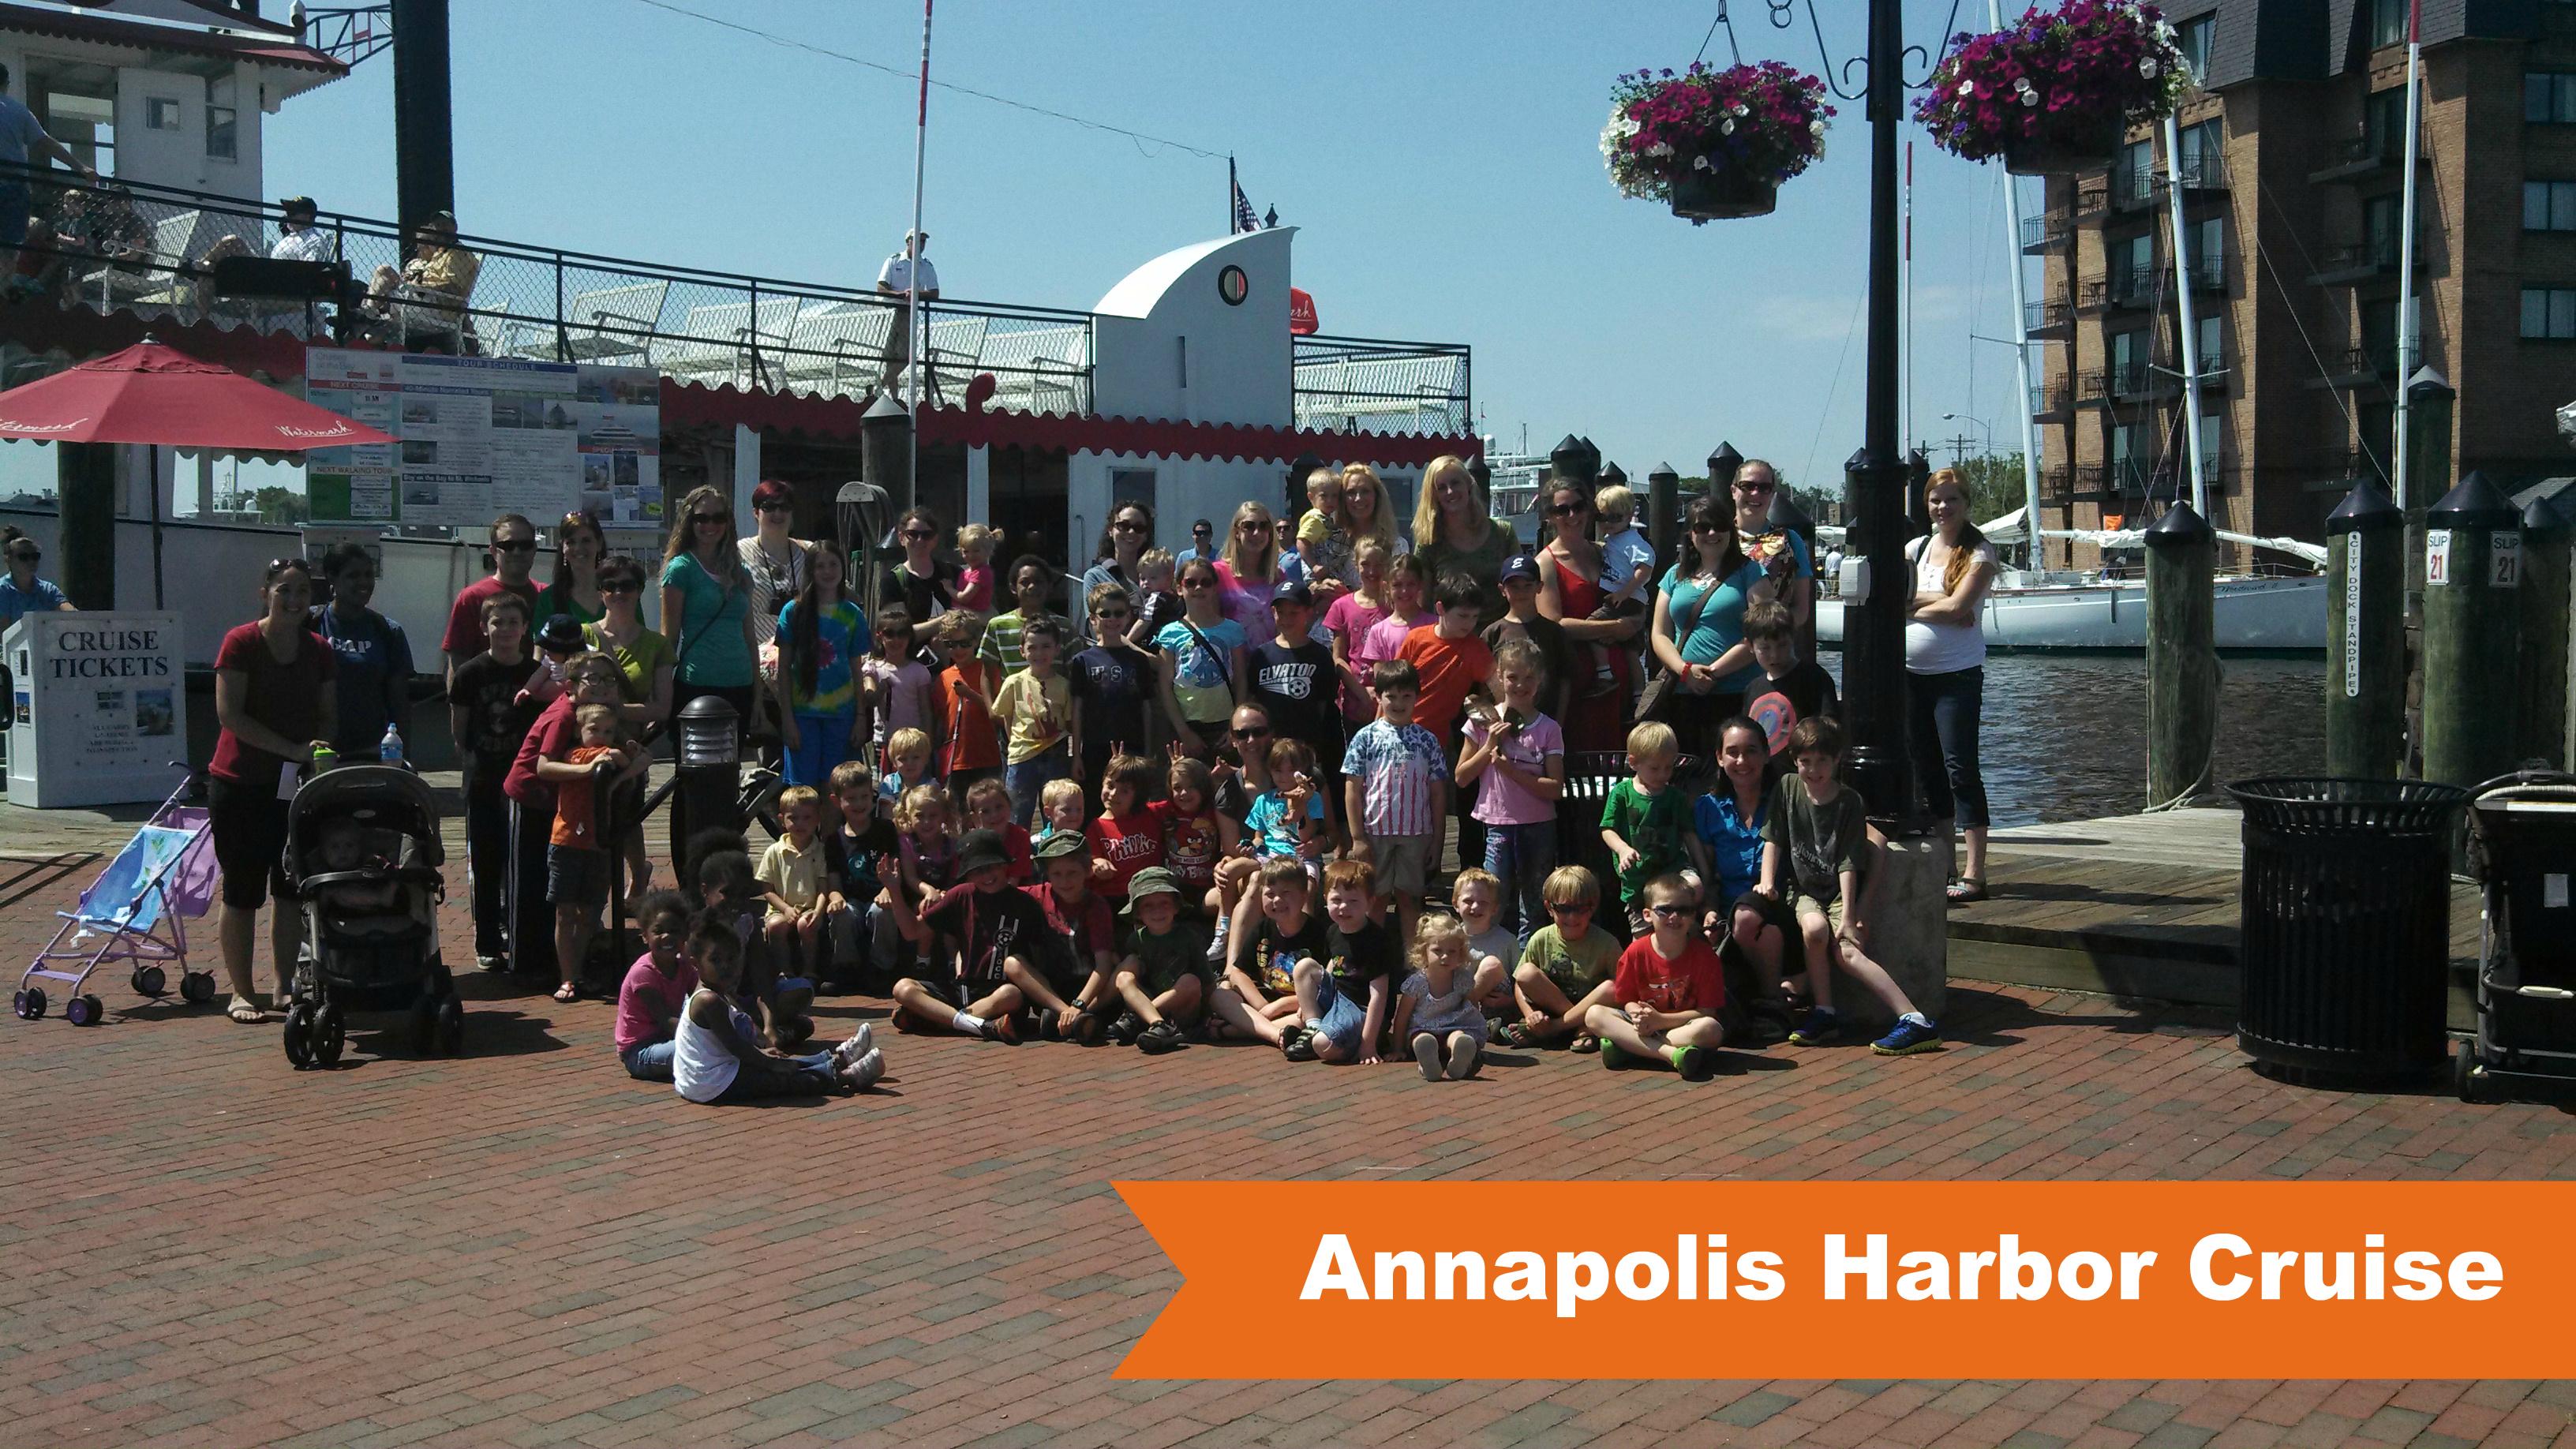 Field Trip Club on a Annapolis Harbor Cruise